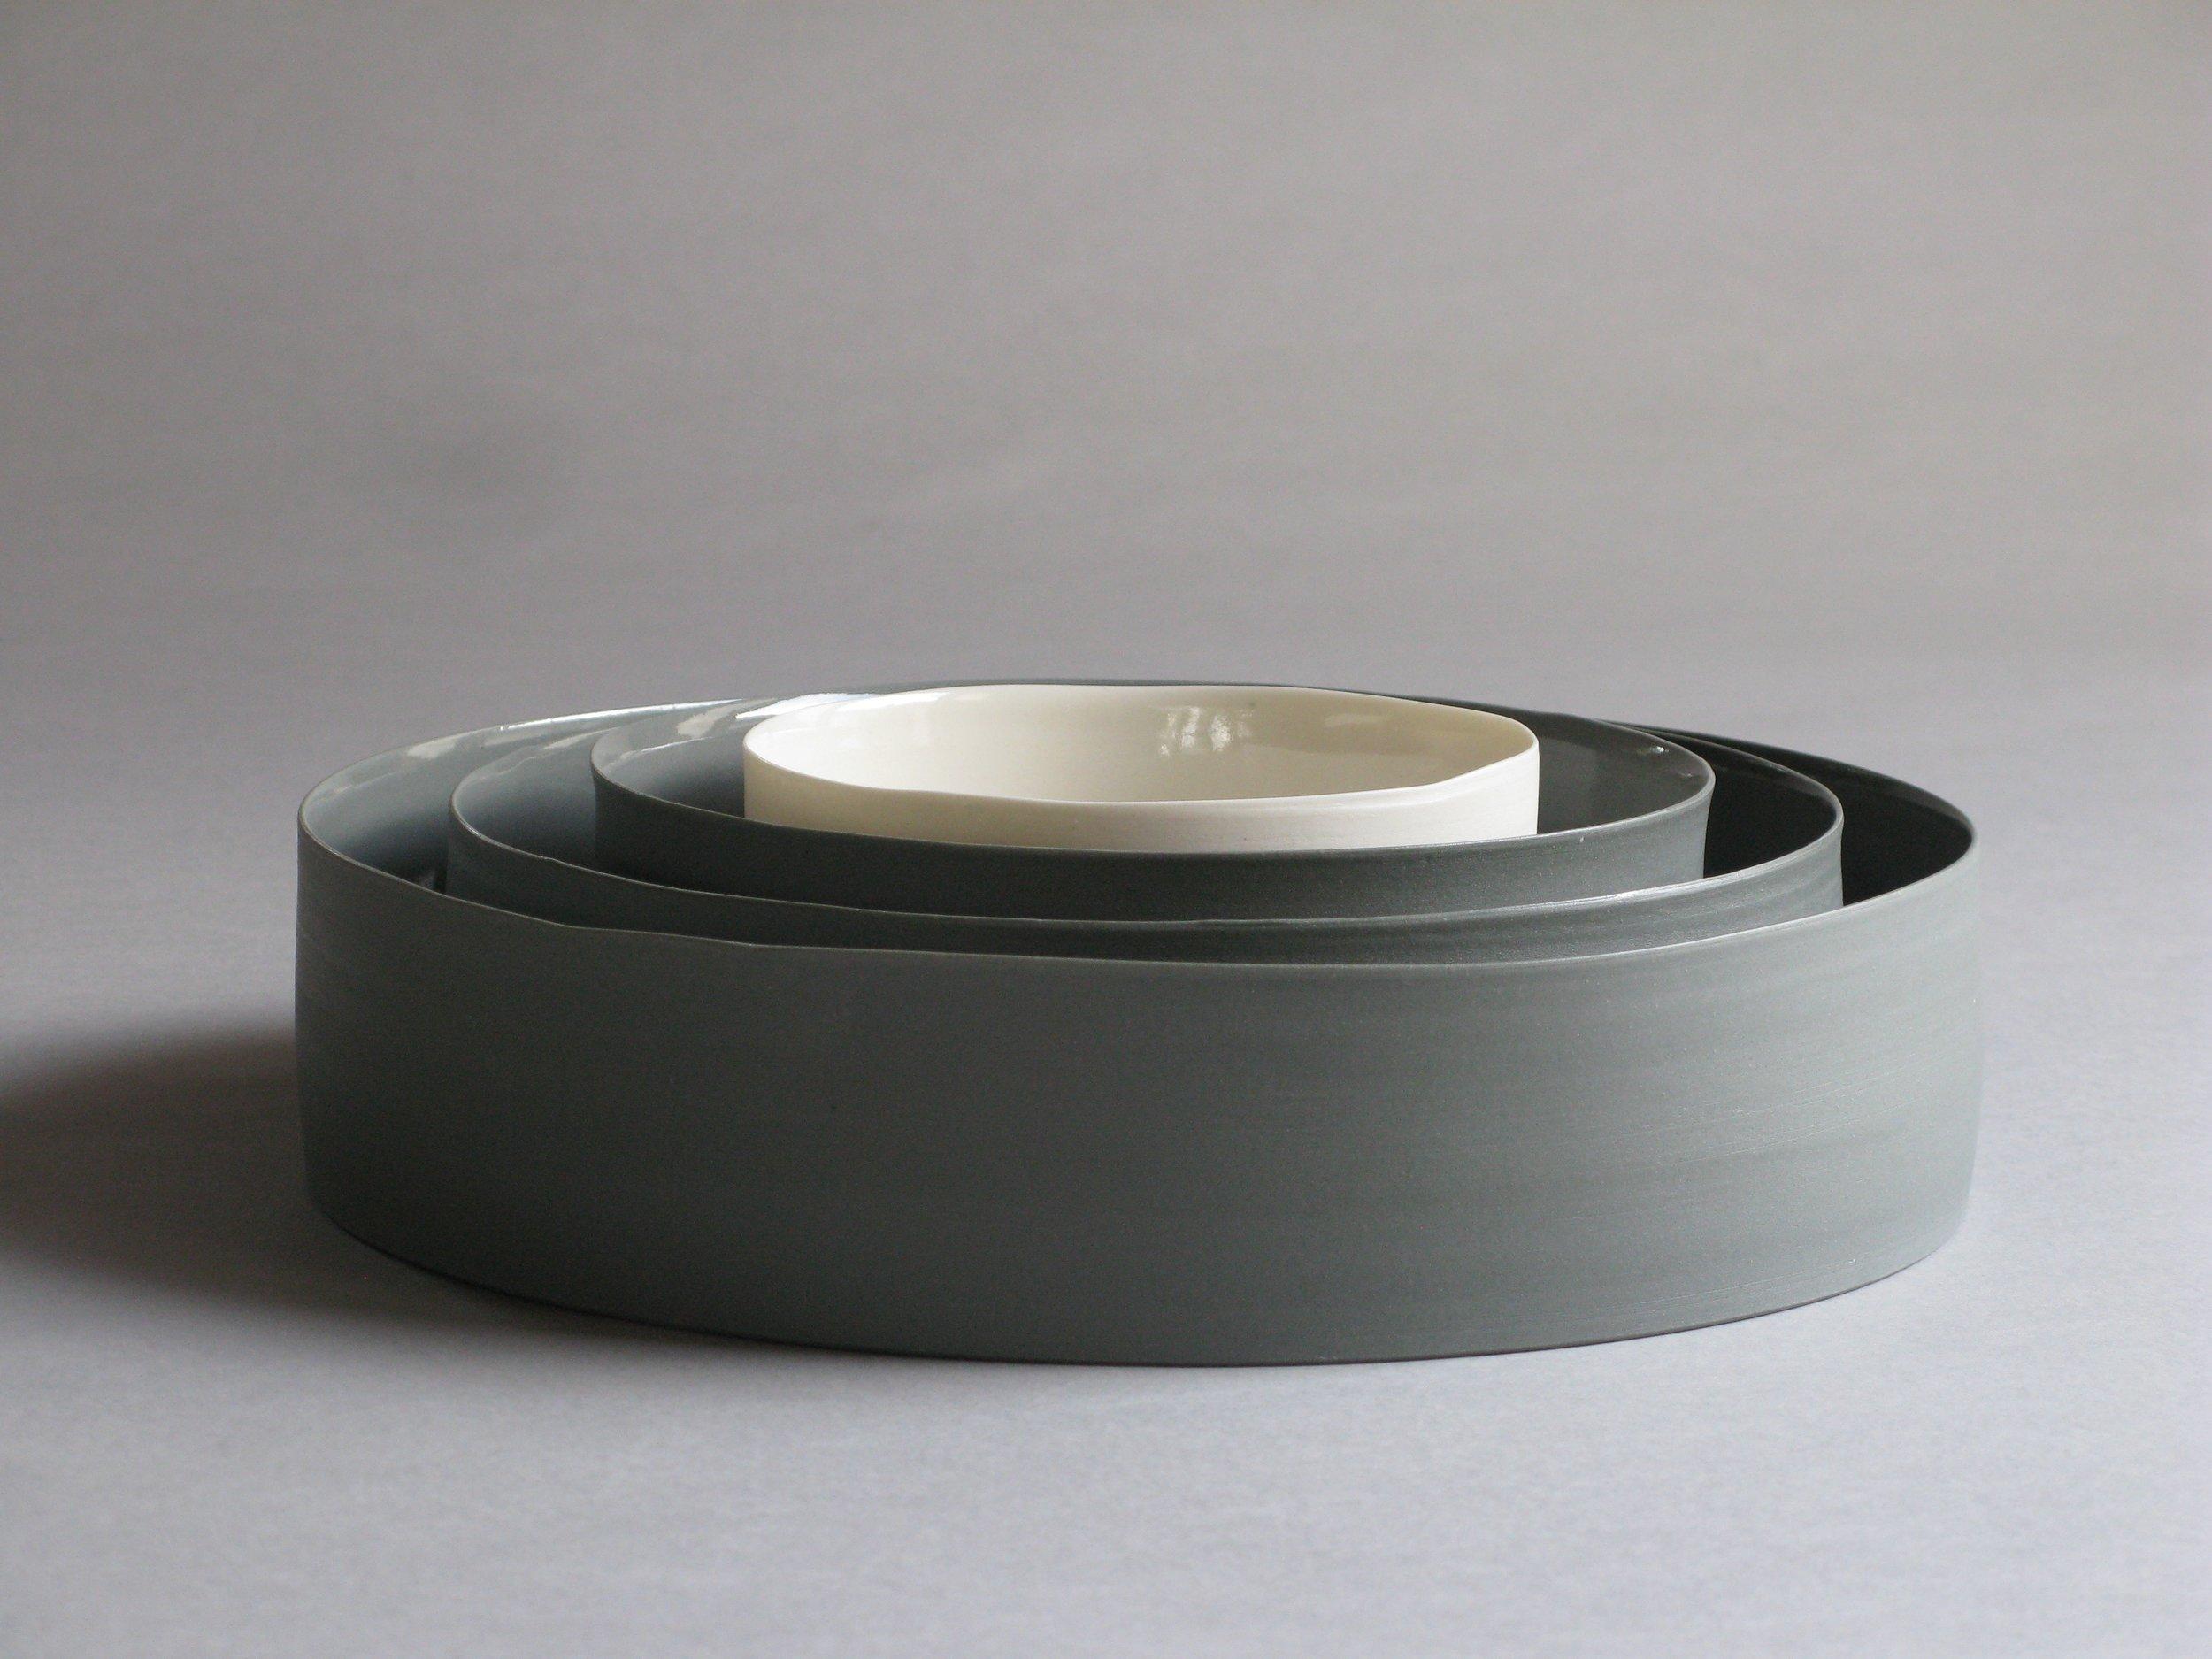 Porcelain ceramic white and grey bowls by Lilith Rockett, Portland, Oregon